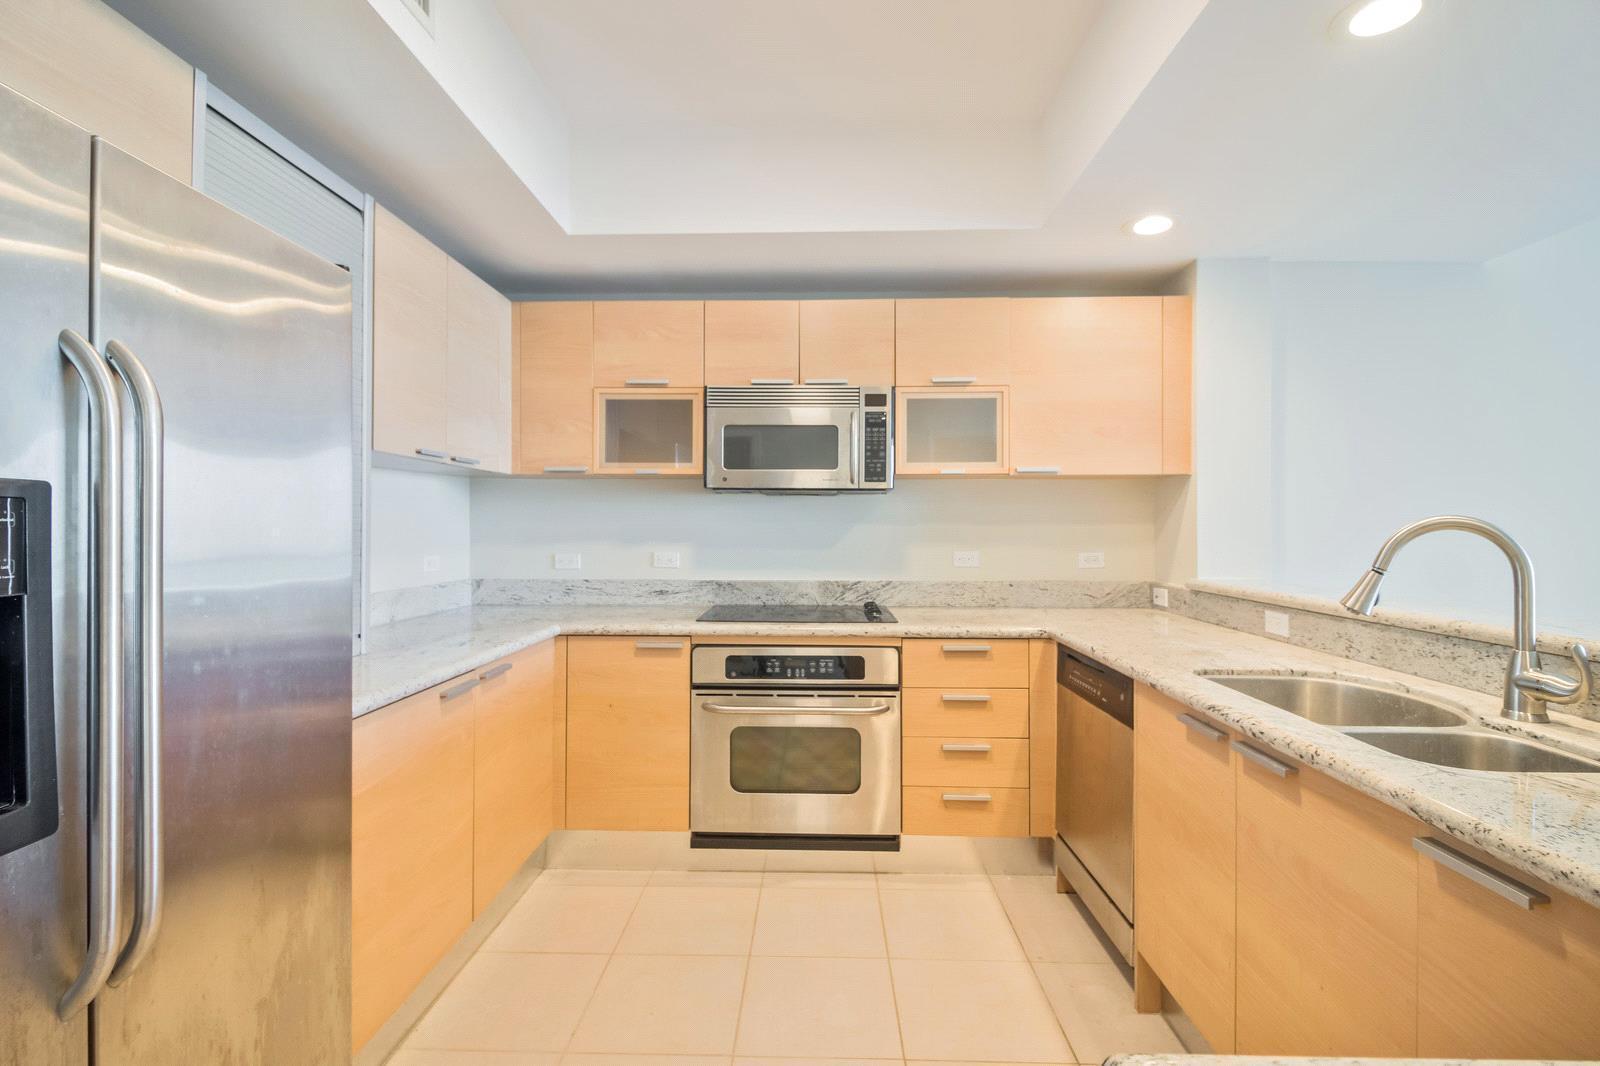 2640 Lake Shore Drive 2115, Riviera Beach, Florida 33404, 2 Bedrooms Bedrooms, ,2.1 BathroomsBathrooms,A,Condominium,Lake Shore,RX-10499174